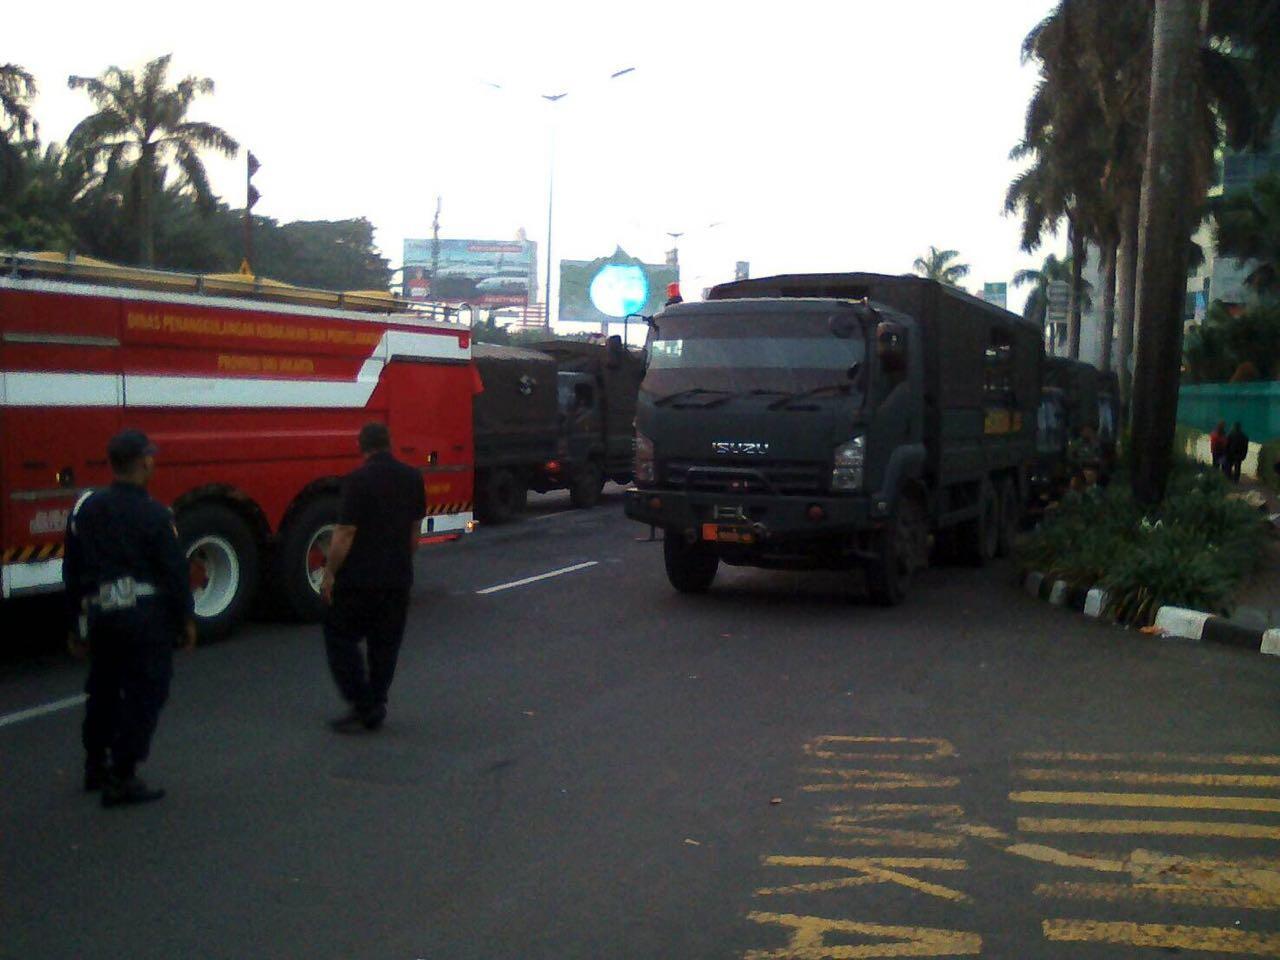 Anggota TNI Mulai Masuk Ke Mako Brimo